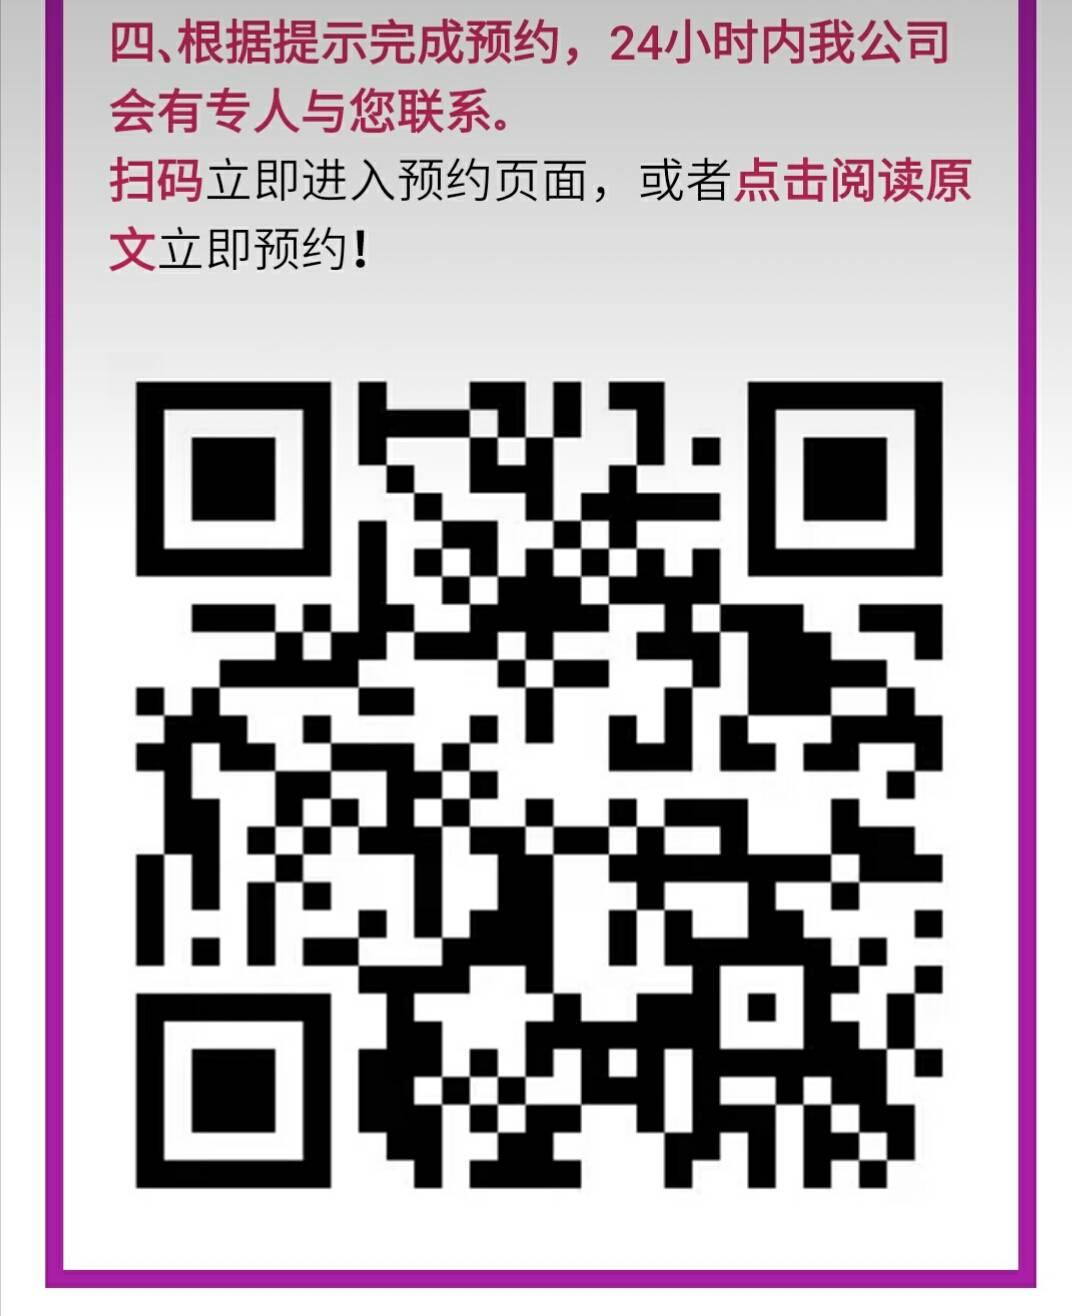 S61124-122207(1).jpg